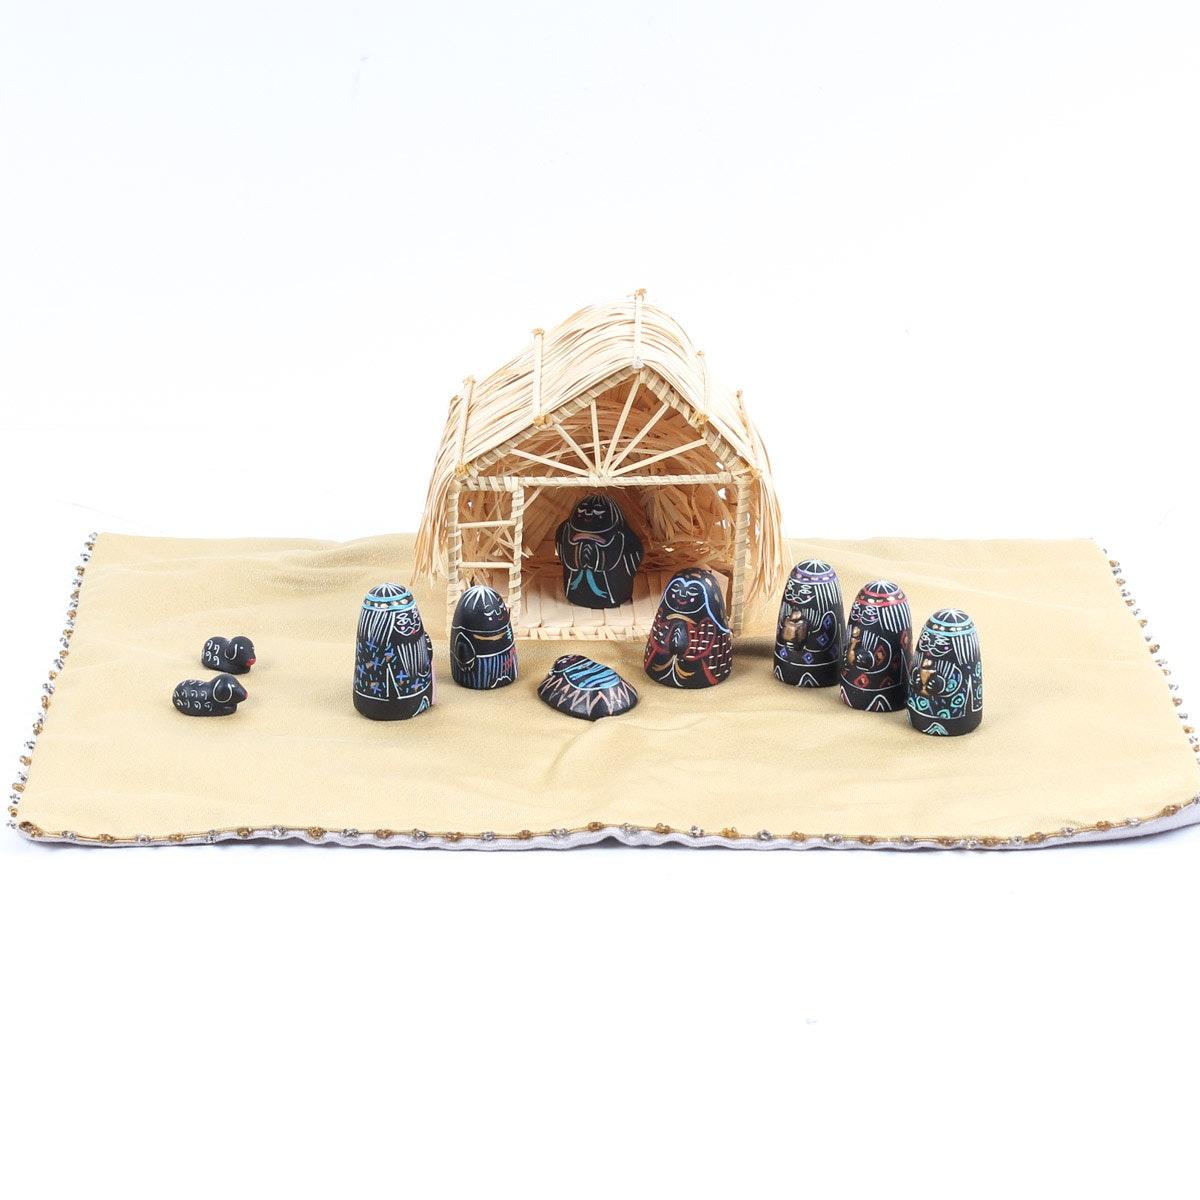 Ten Thousand Villages Hand Painted Nativity